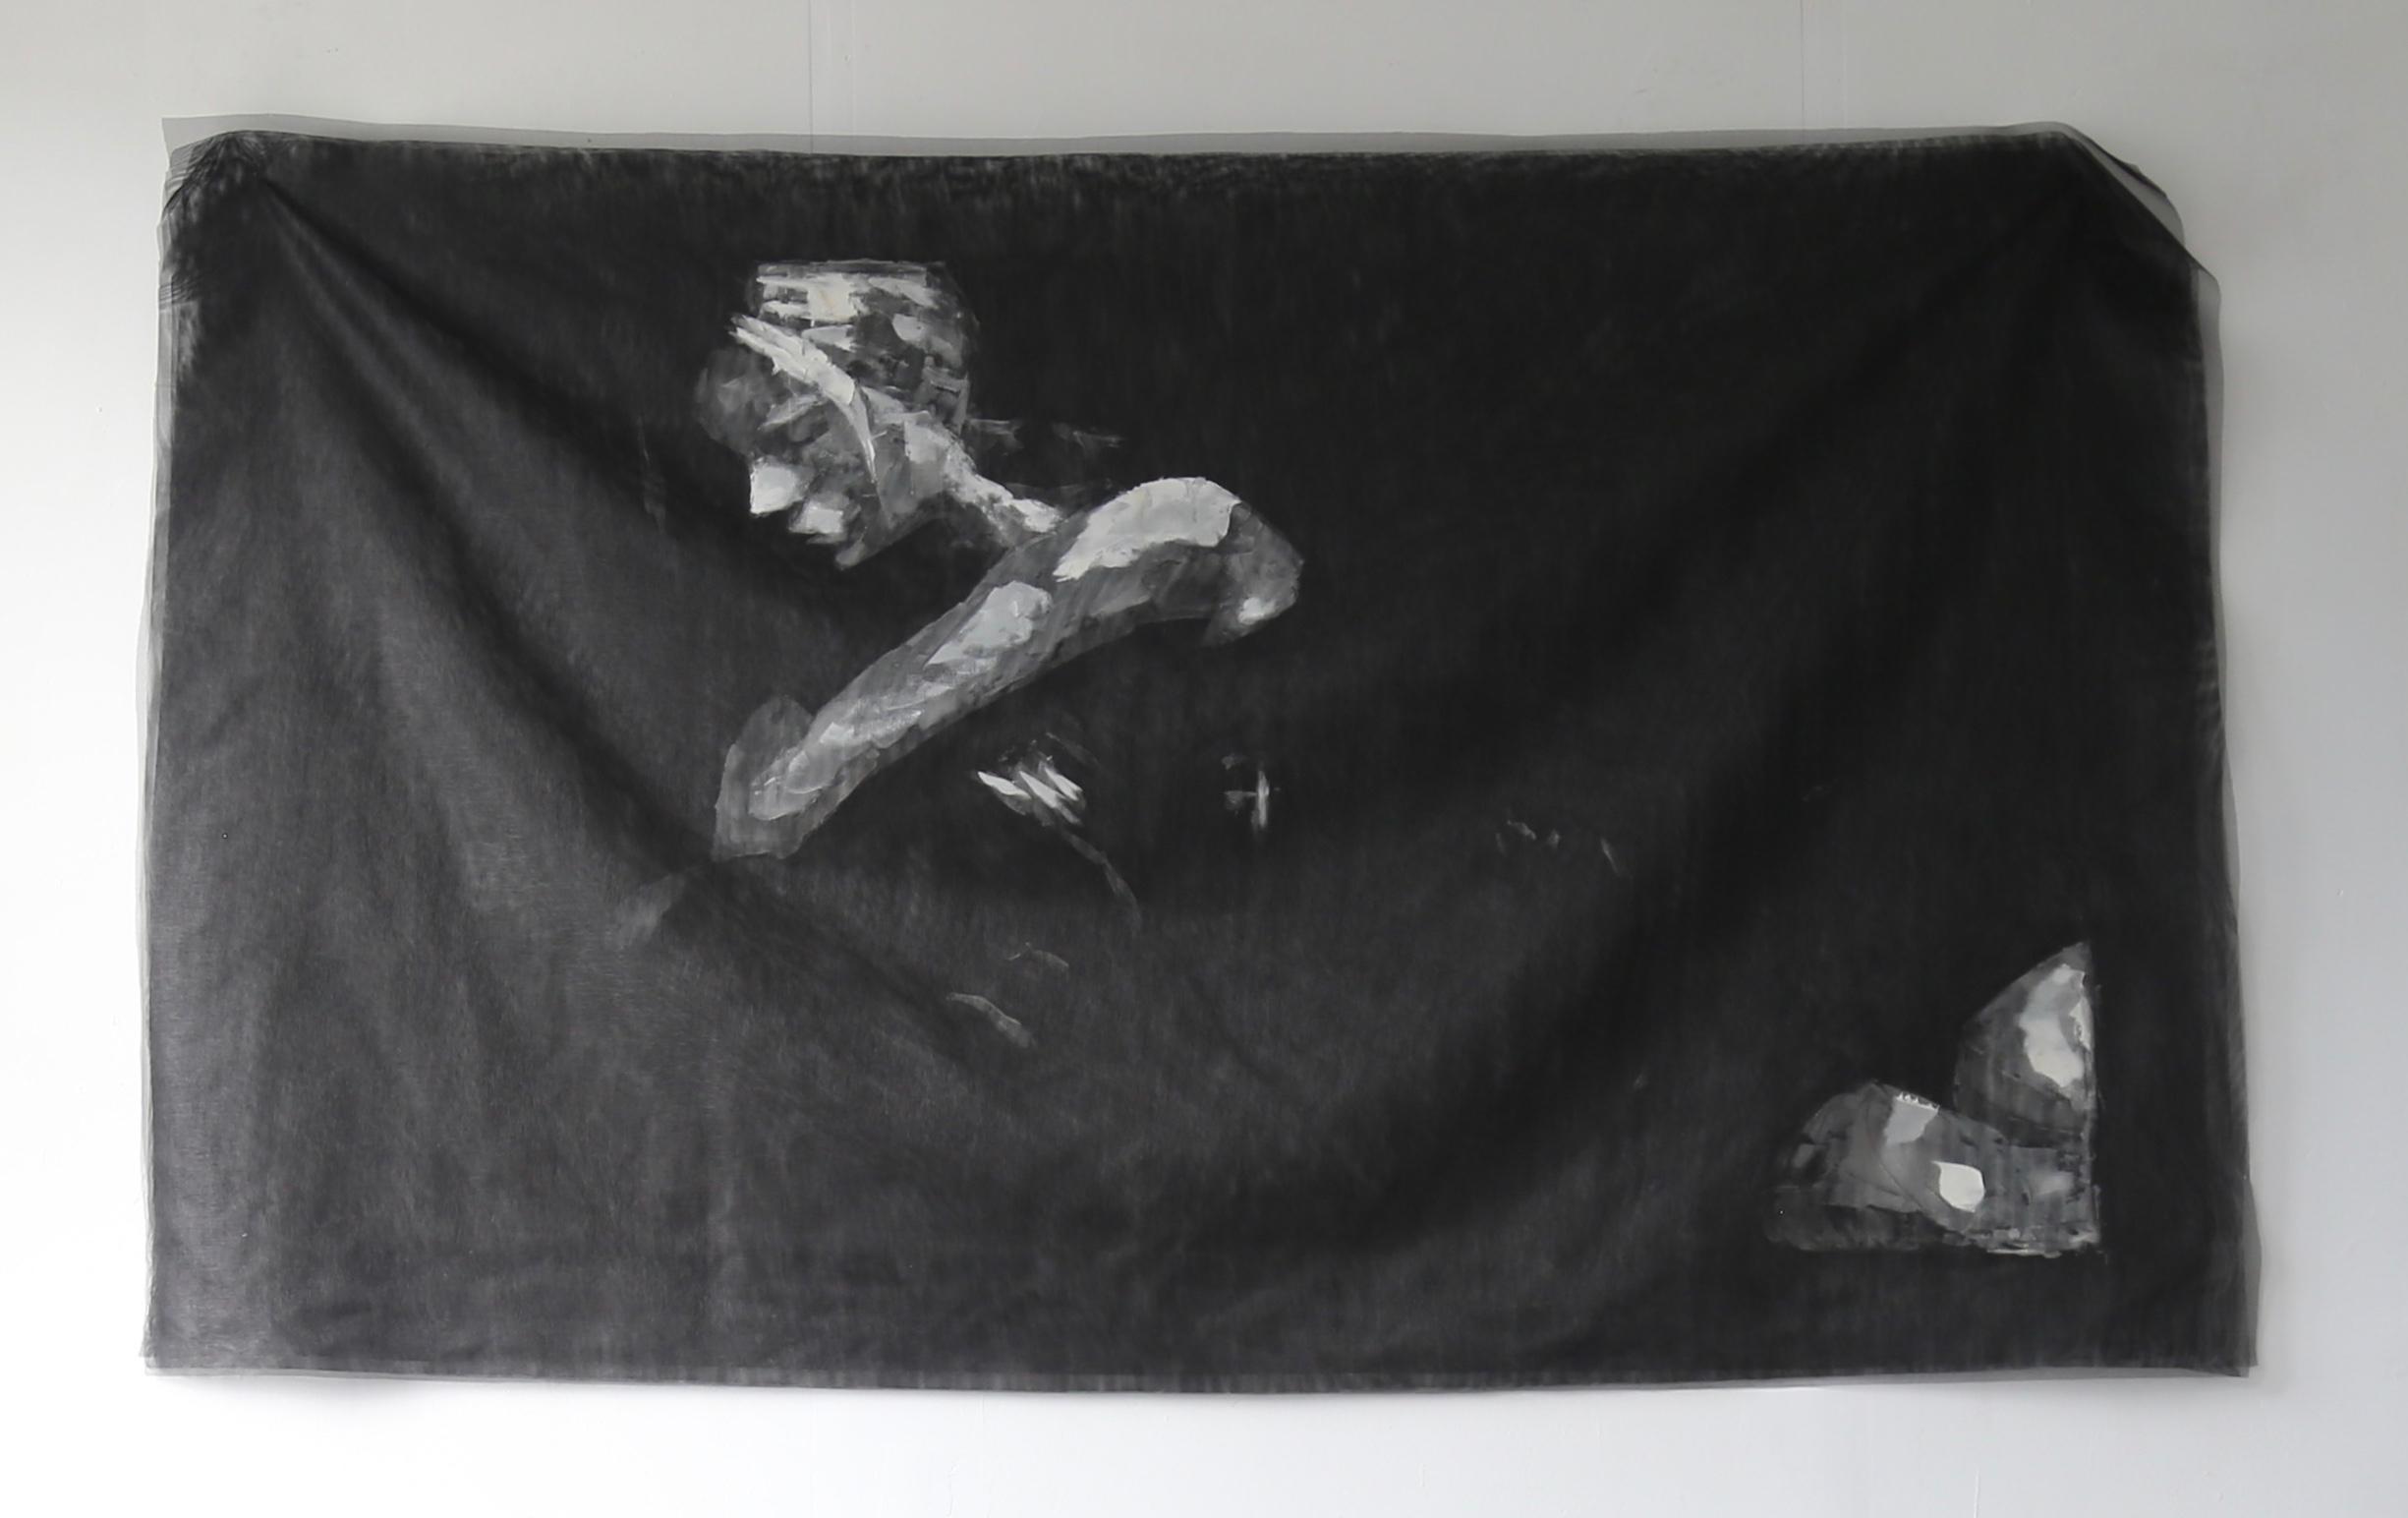 Untitled (Reclining horizontal), 2006